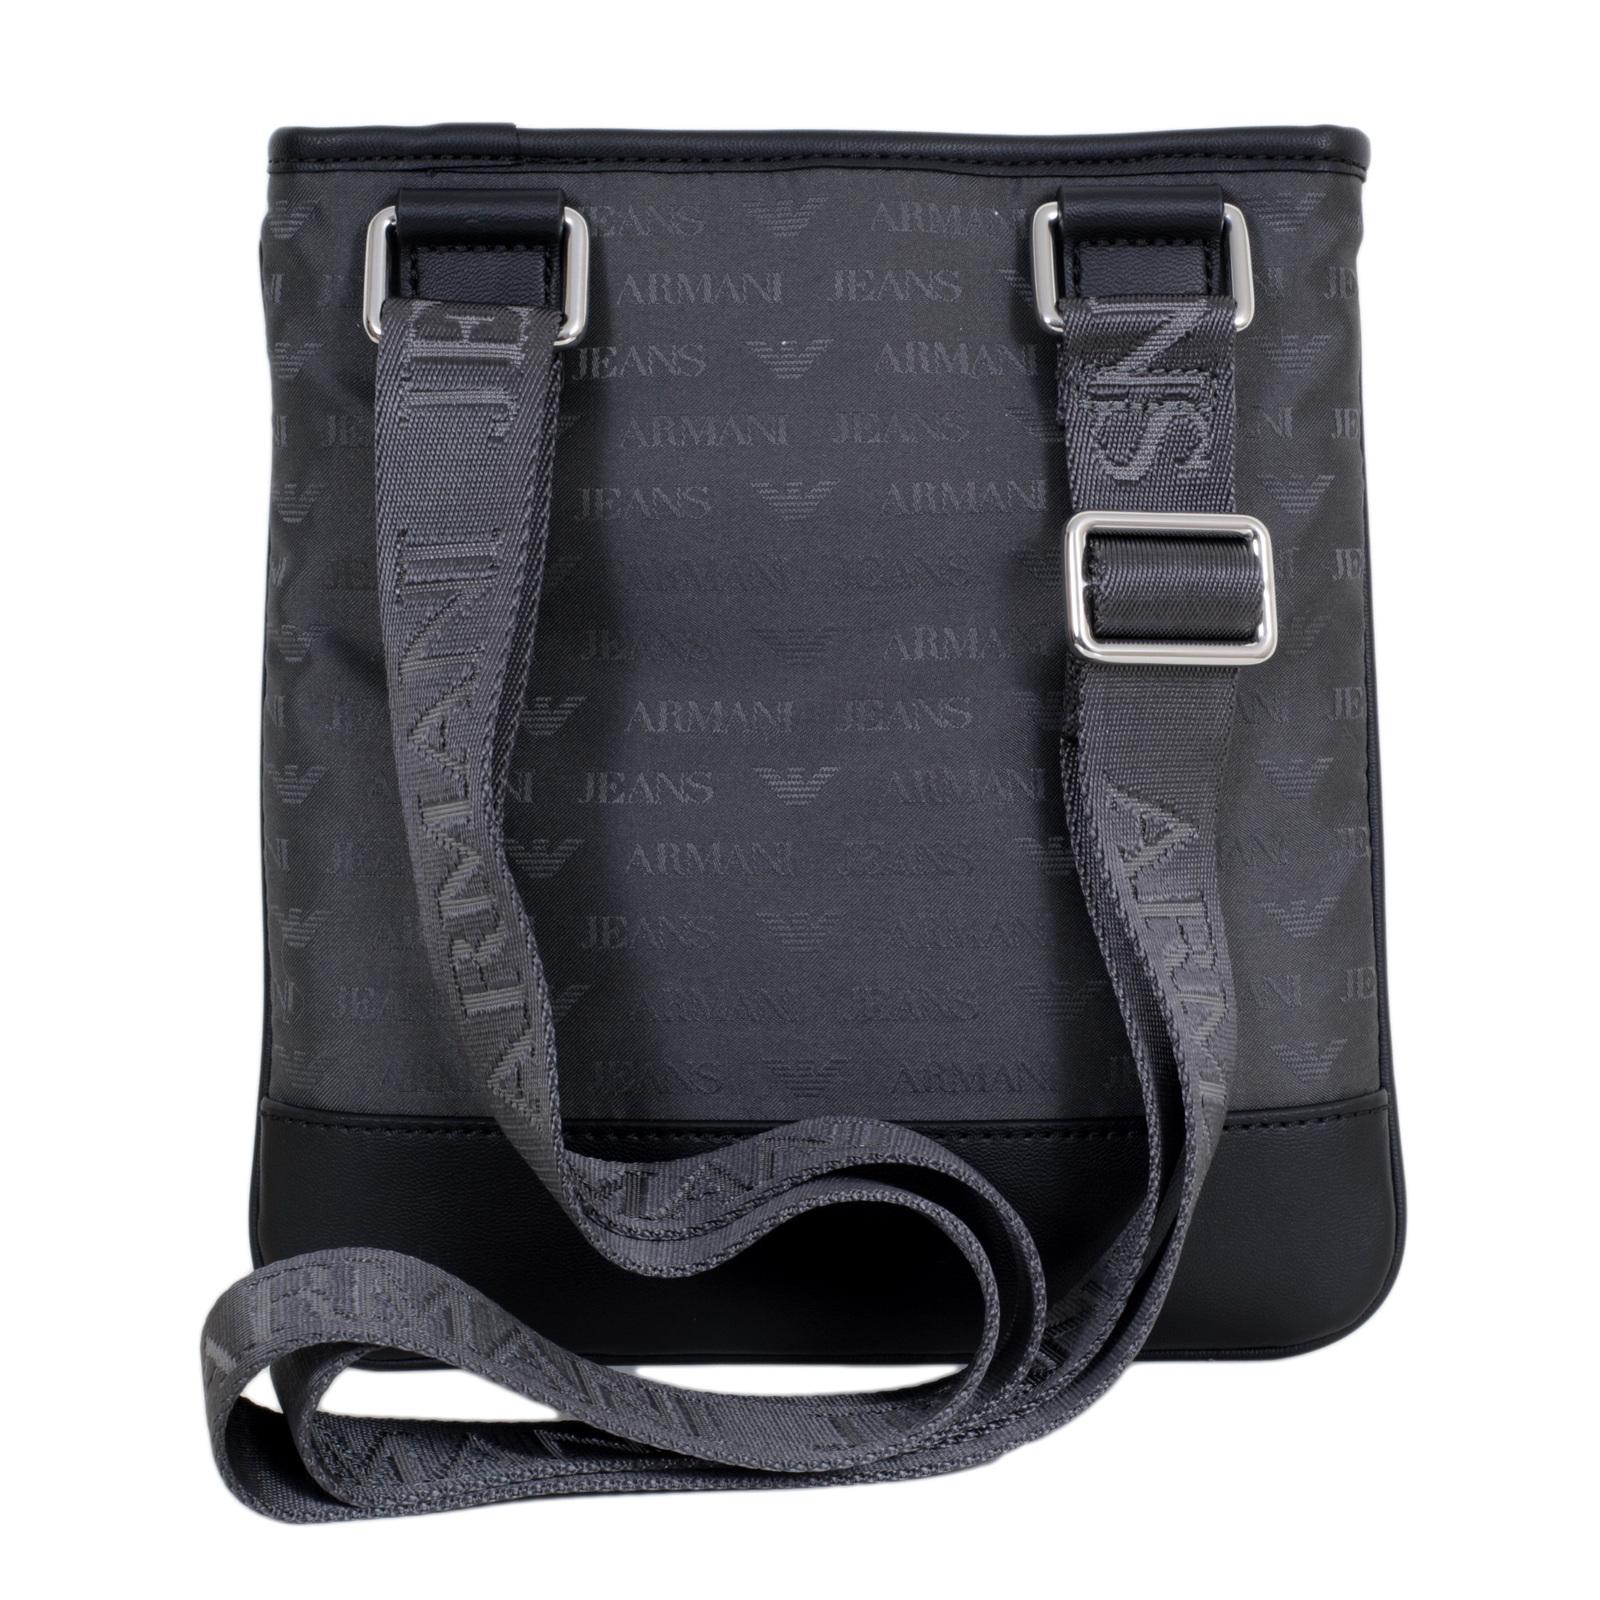 590899a756df Grey Armani Jeans Bag